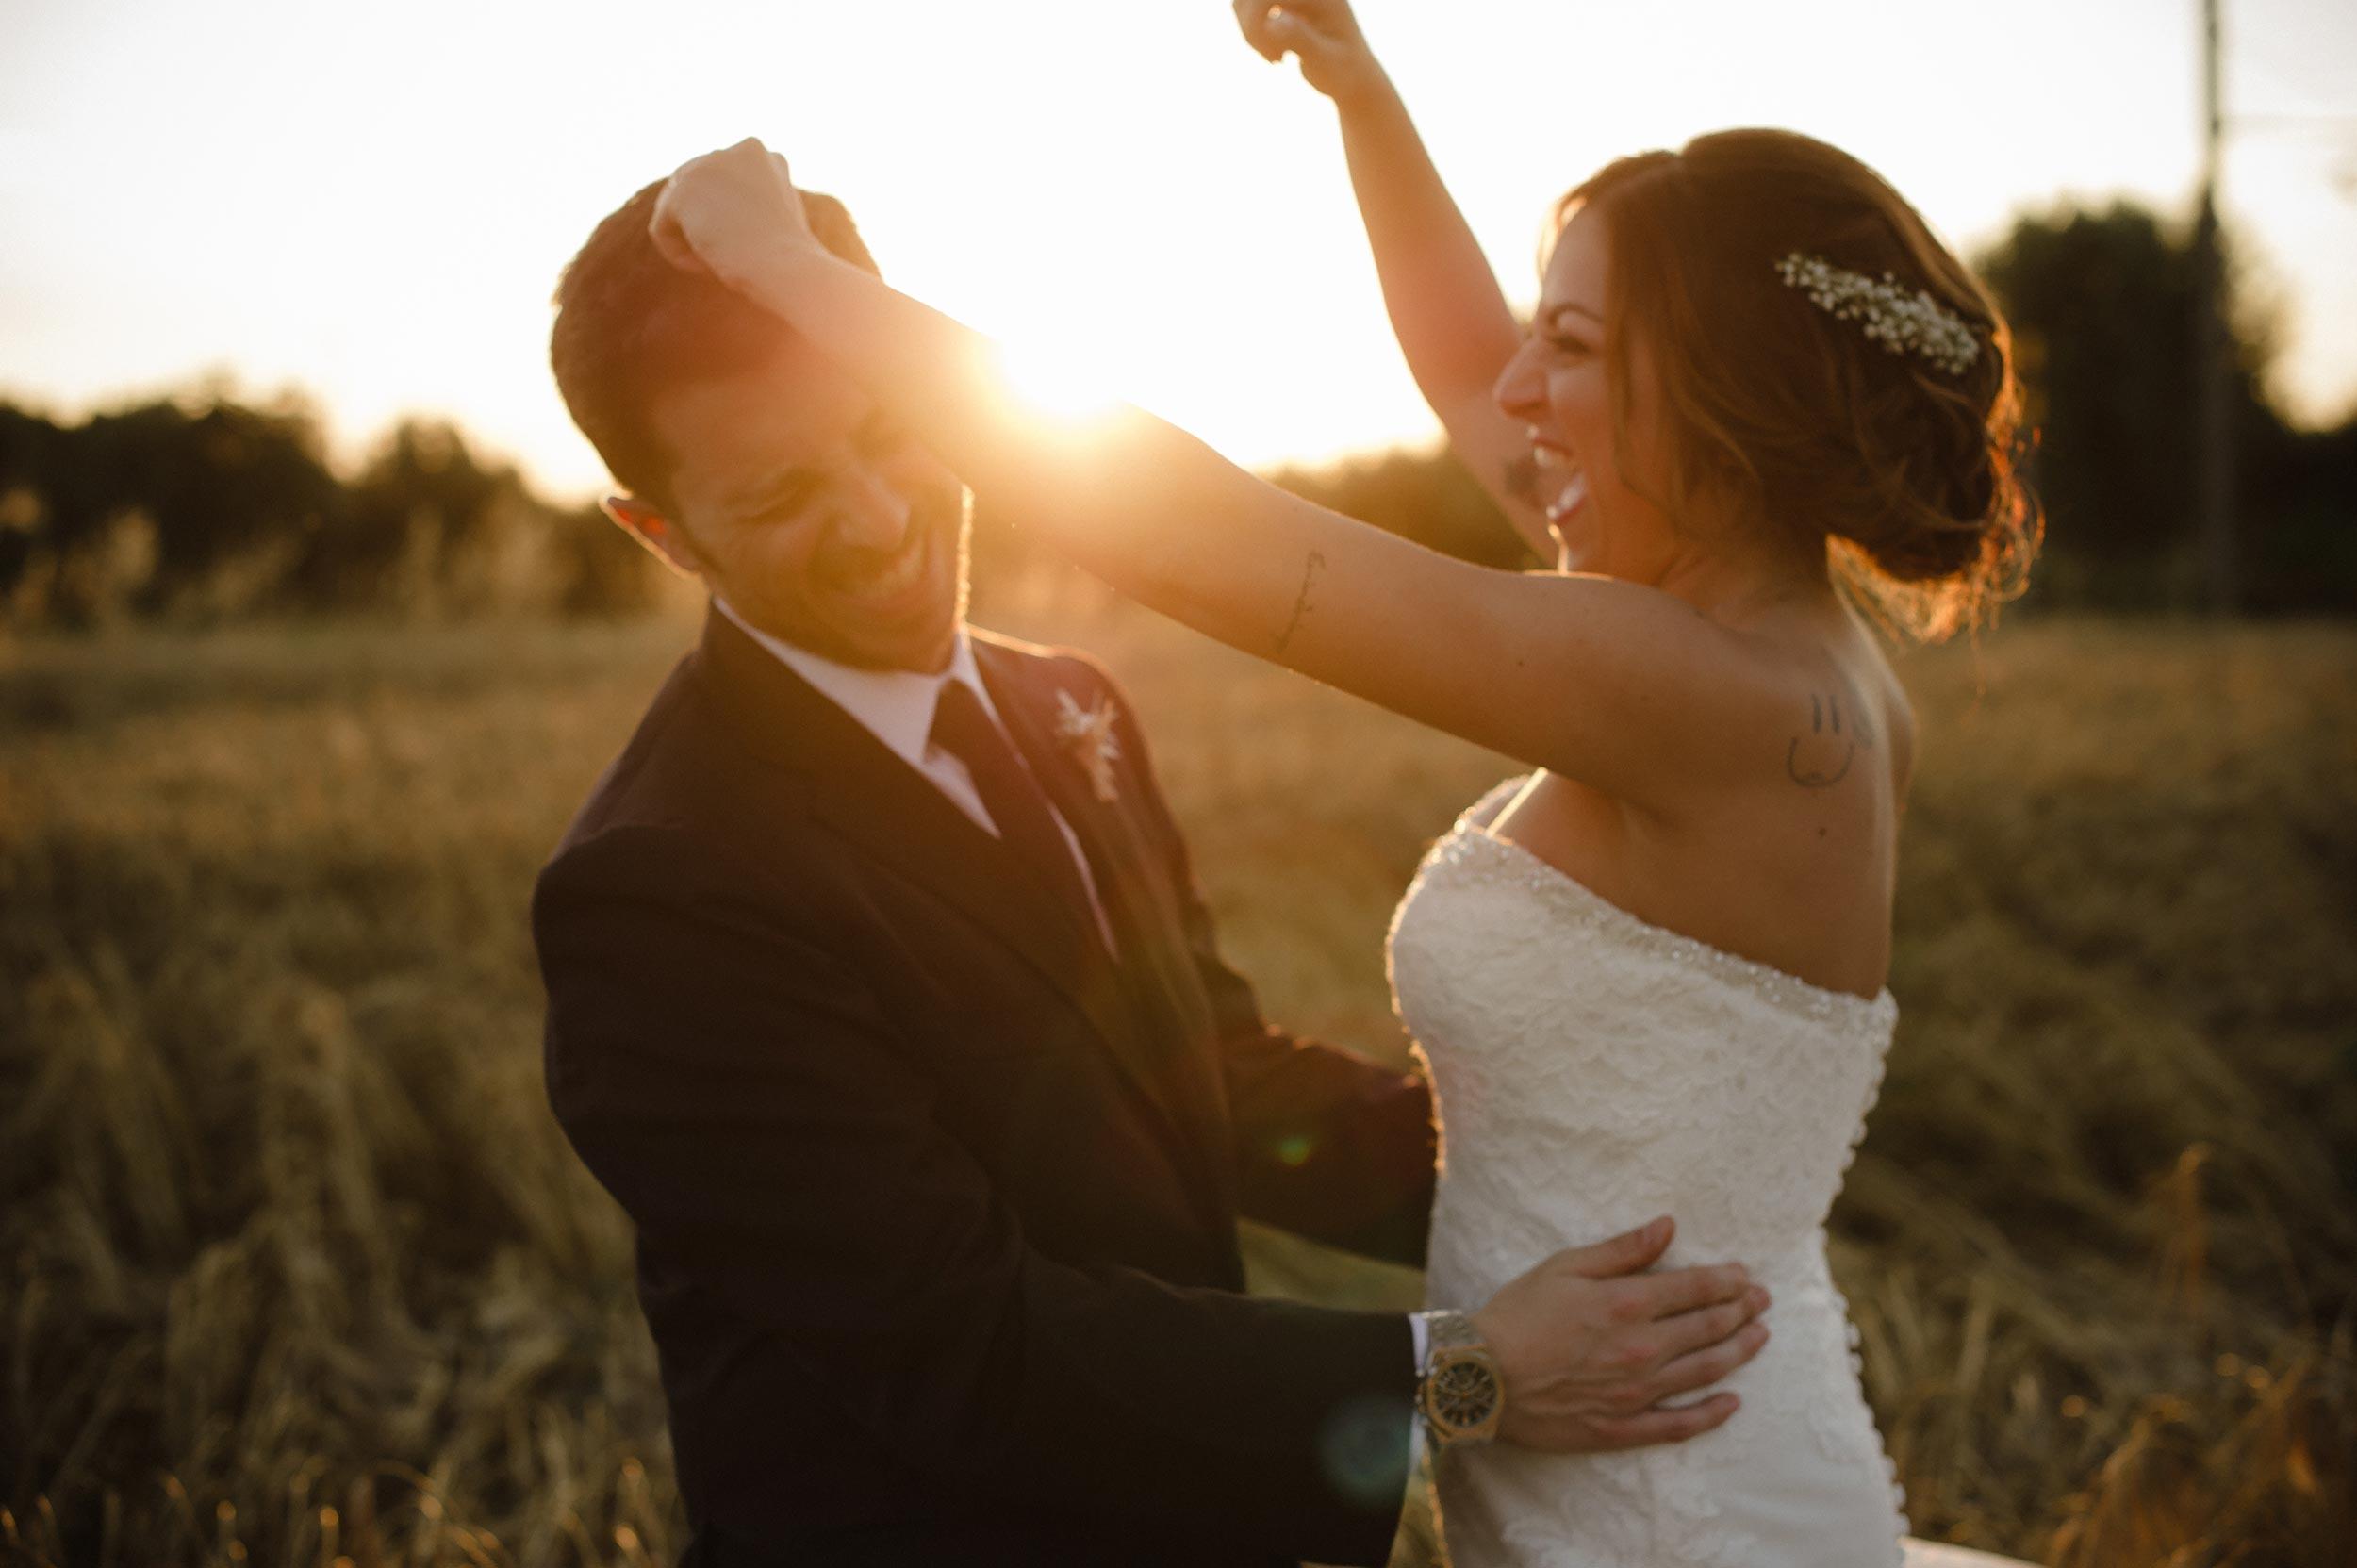 2016-Claudio-Teresa-Naples-Wedding-Photographer-Italy-Alessandro-Avenali-81.jpg